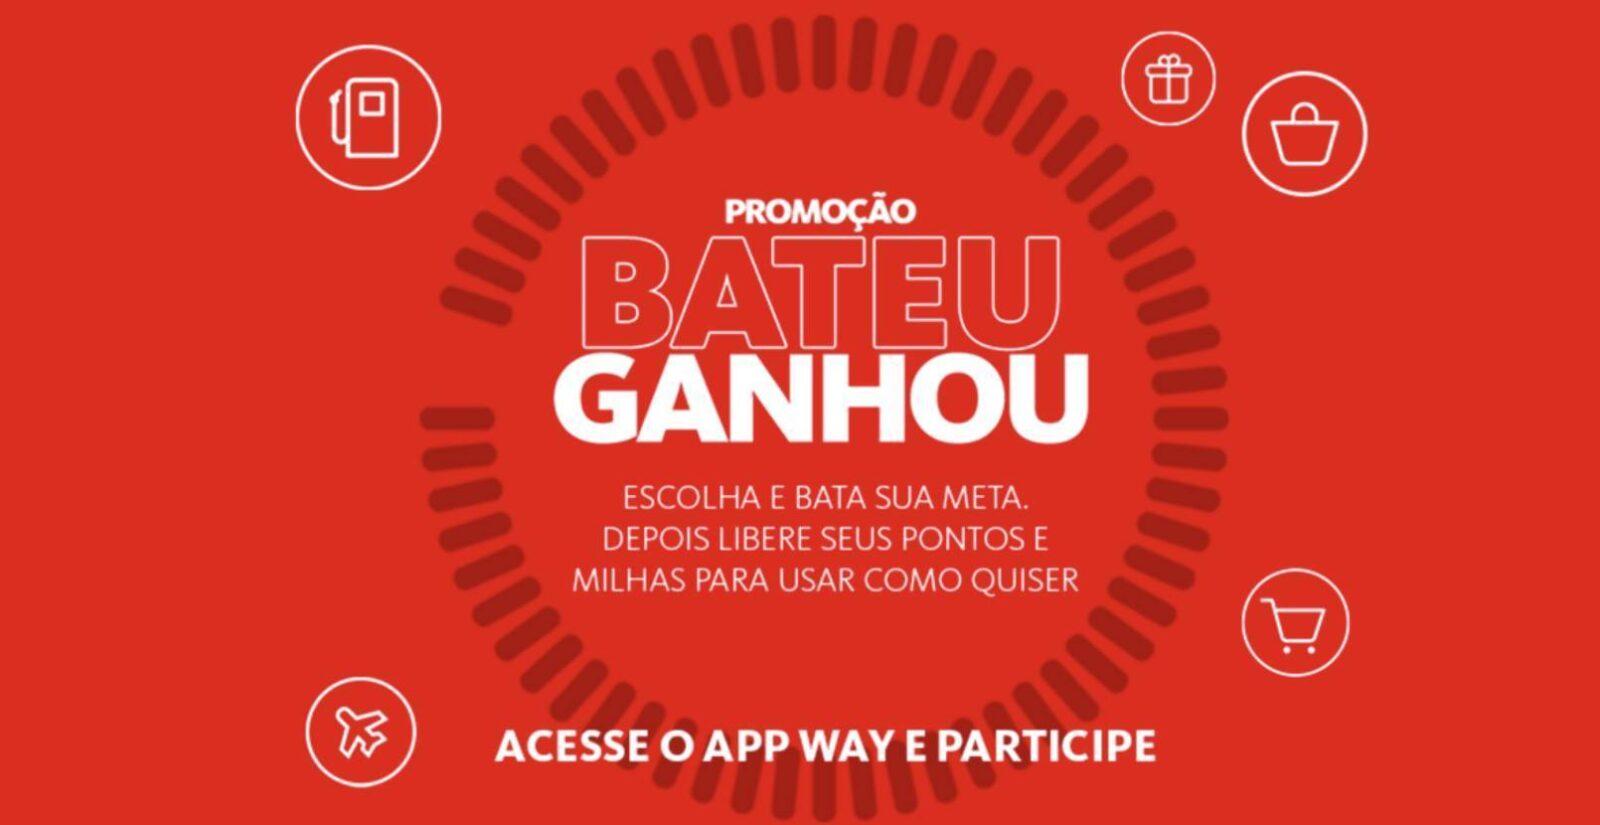 Santander Bateu, Ganhou